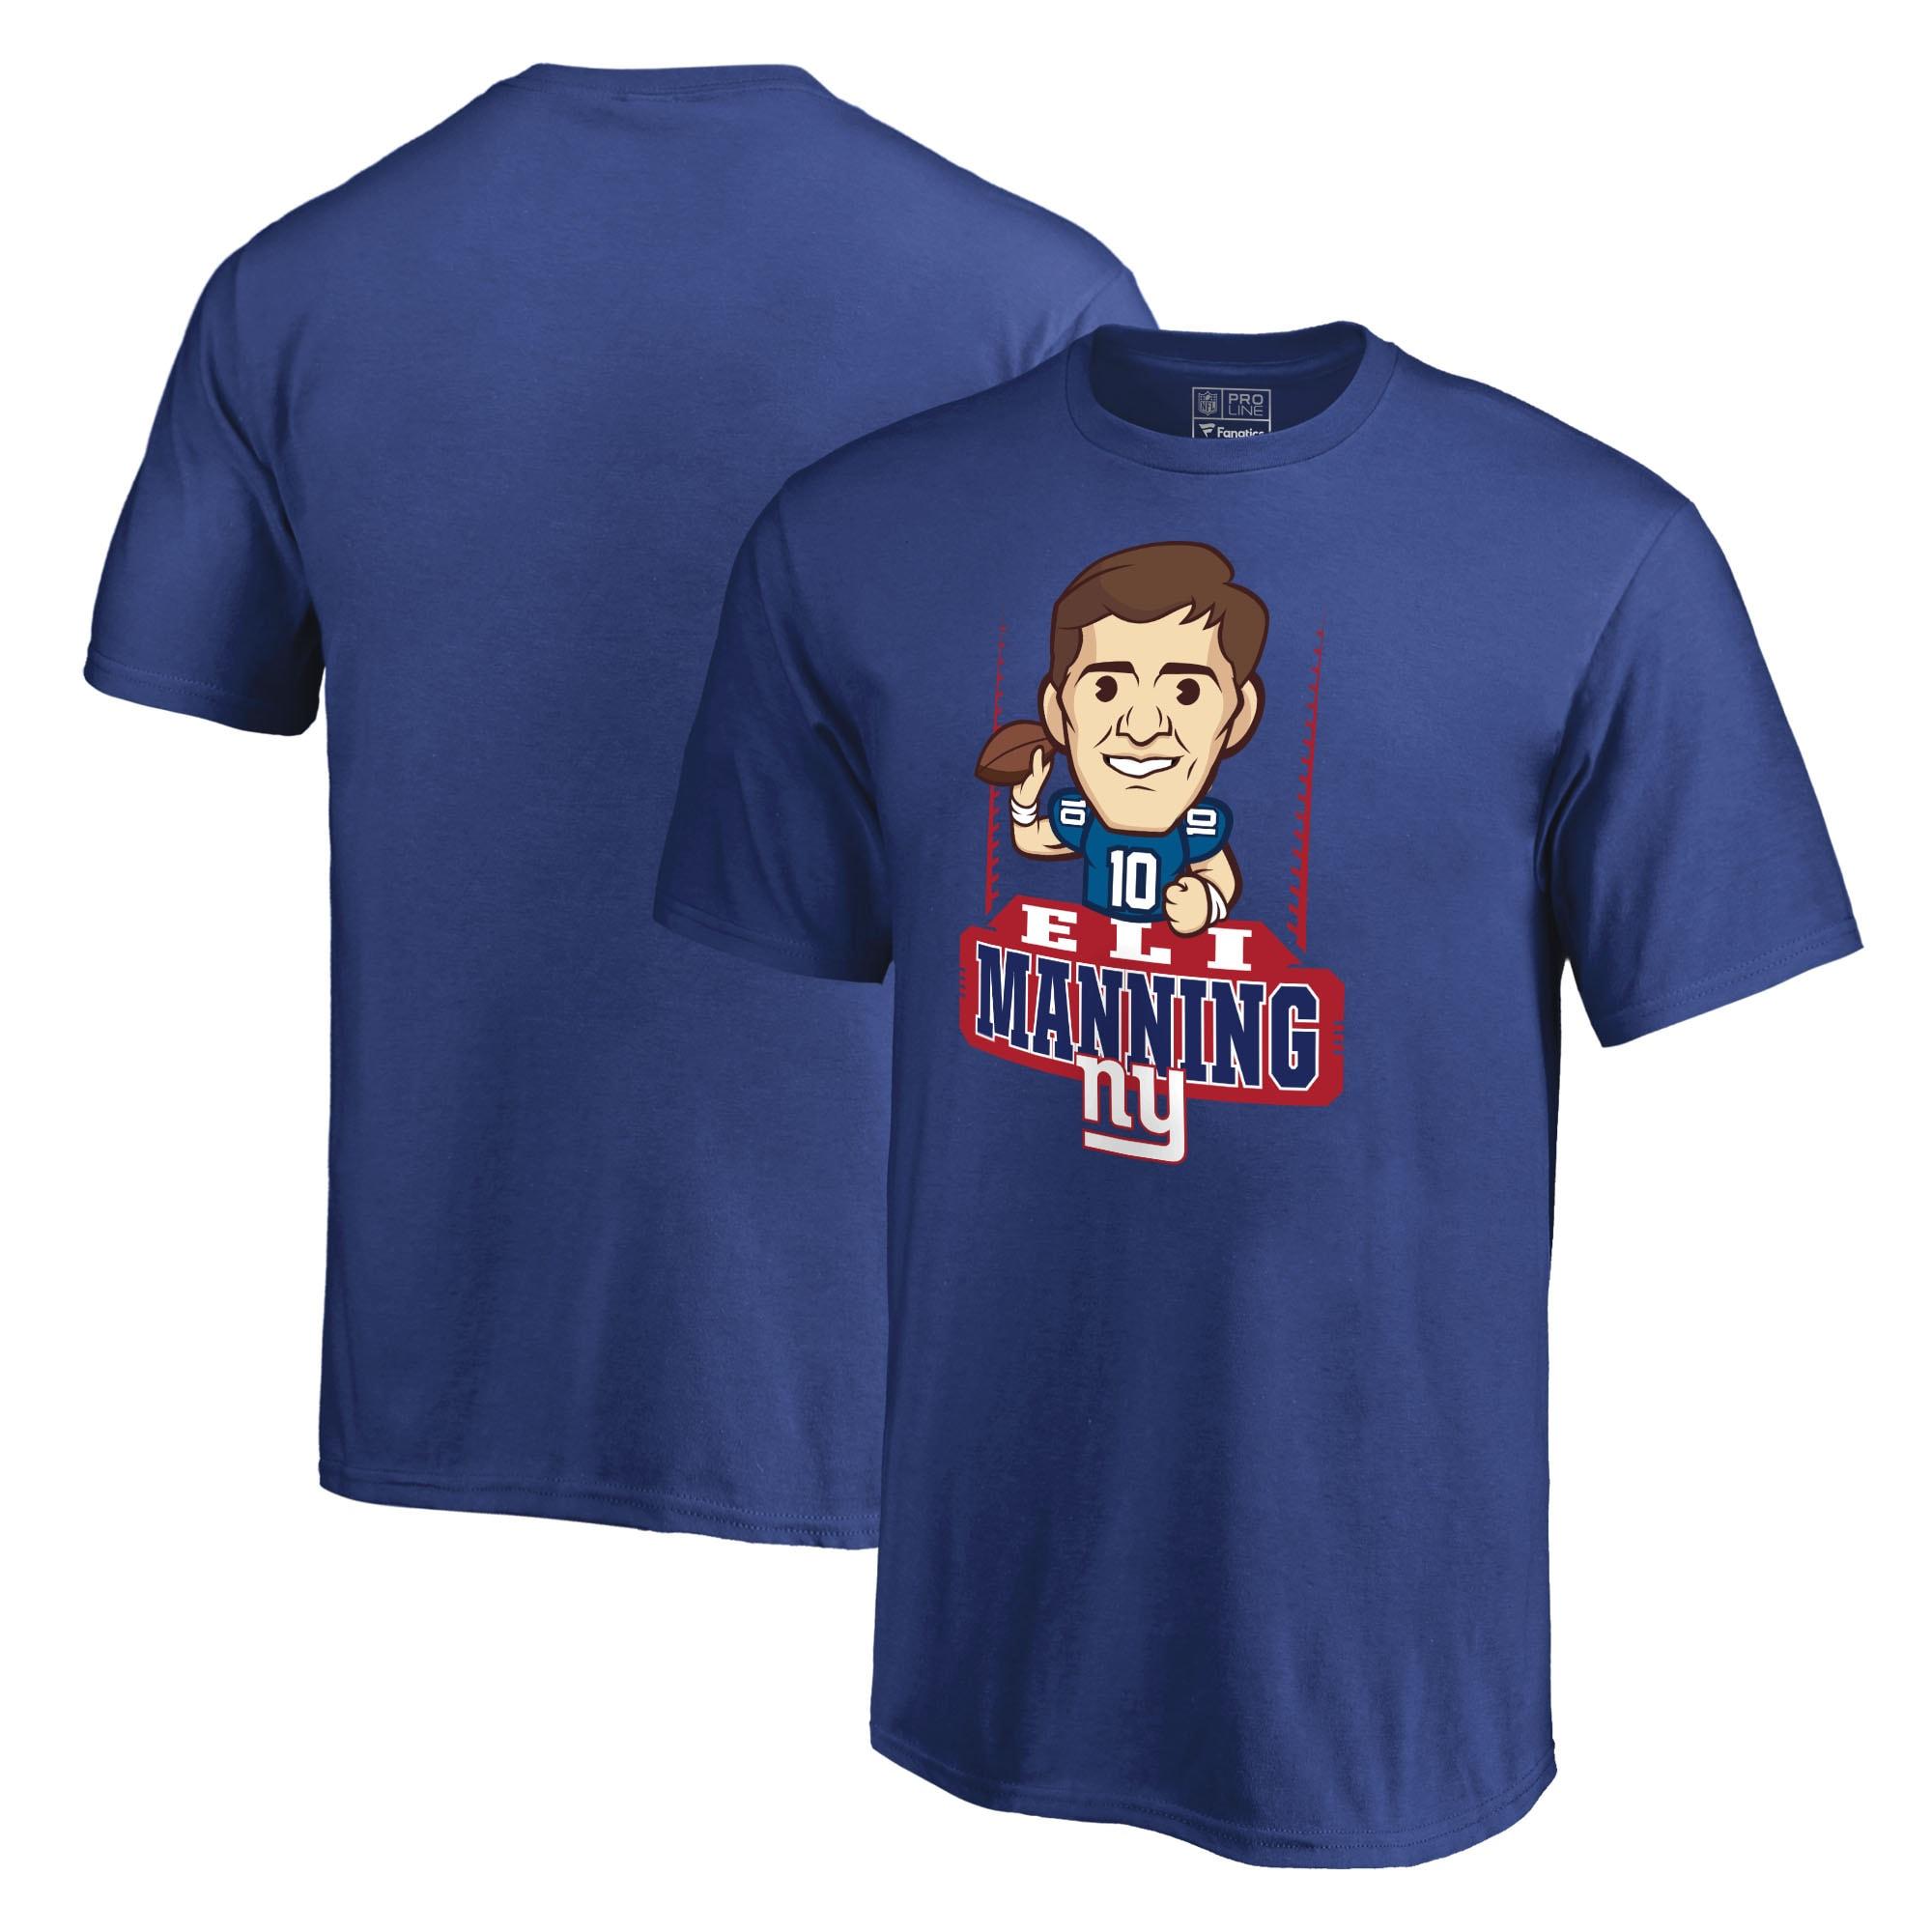 Eli Manning New York Giants NFL Pro Line Youth Emoji Player T-Shirt - Royal